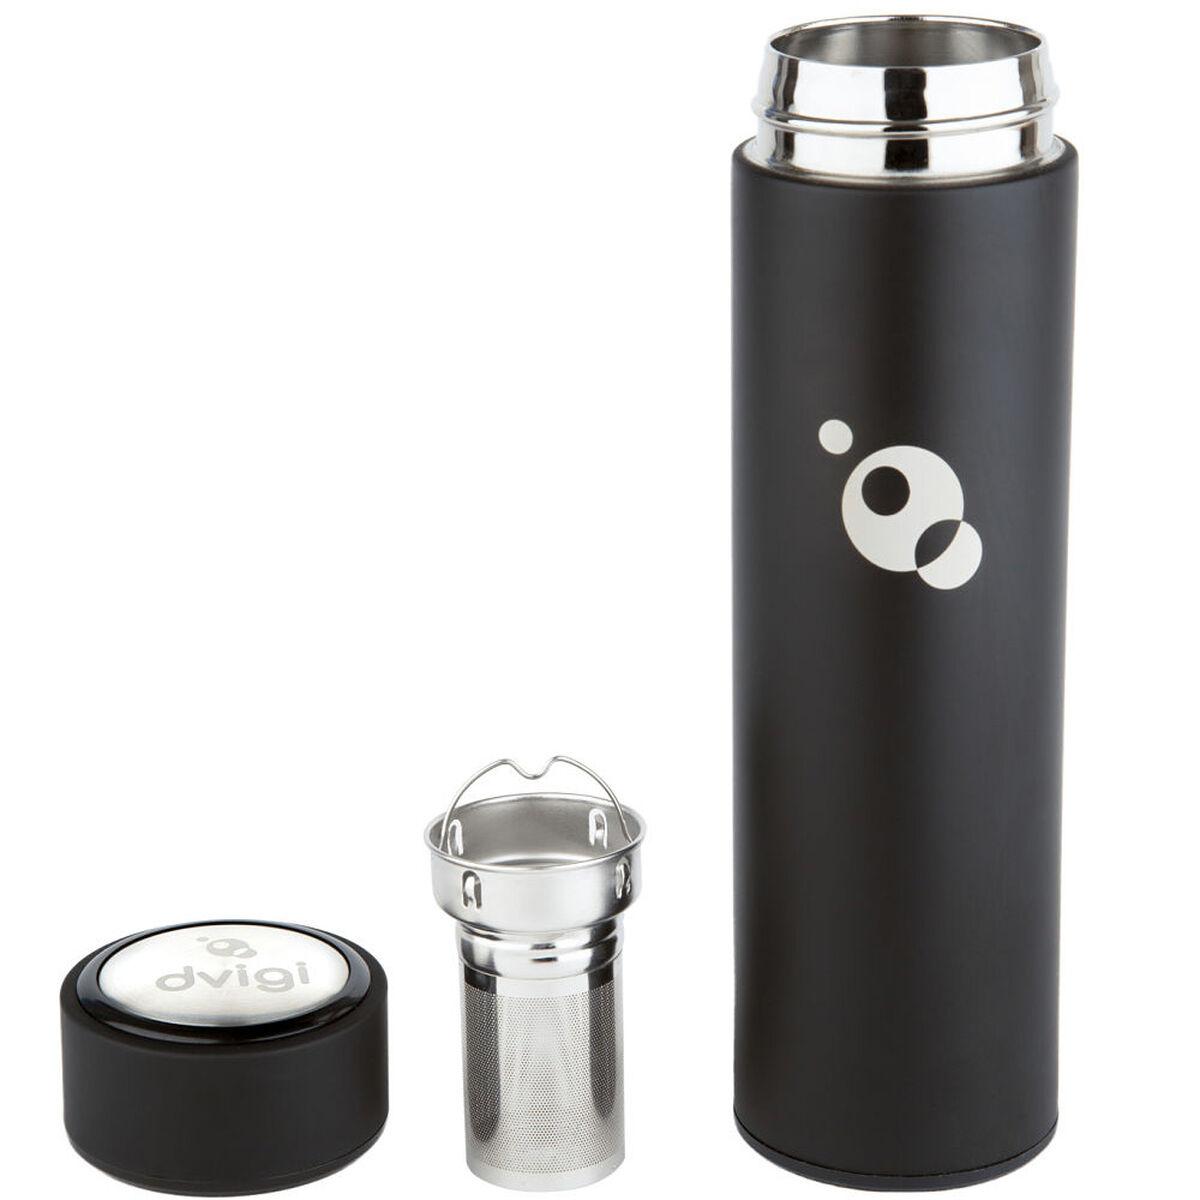 Botella Hidrogenadora de Agua Hydrobot + Botella Magnum Dvigi Negro